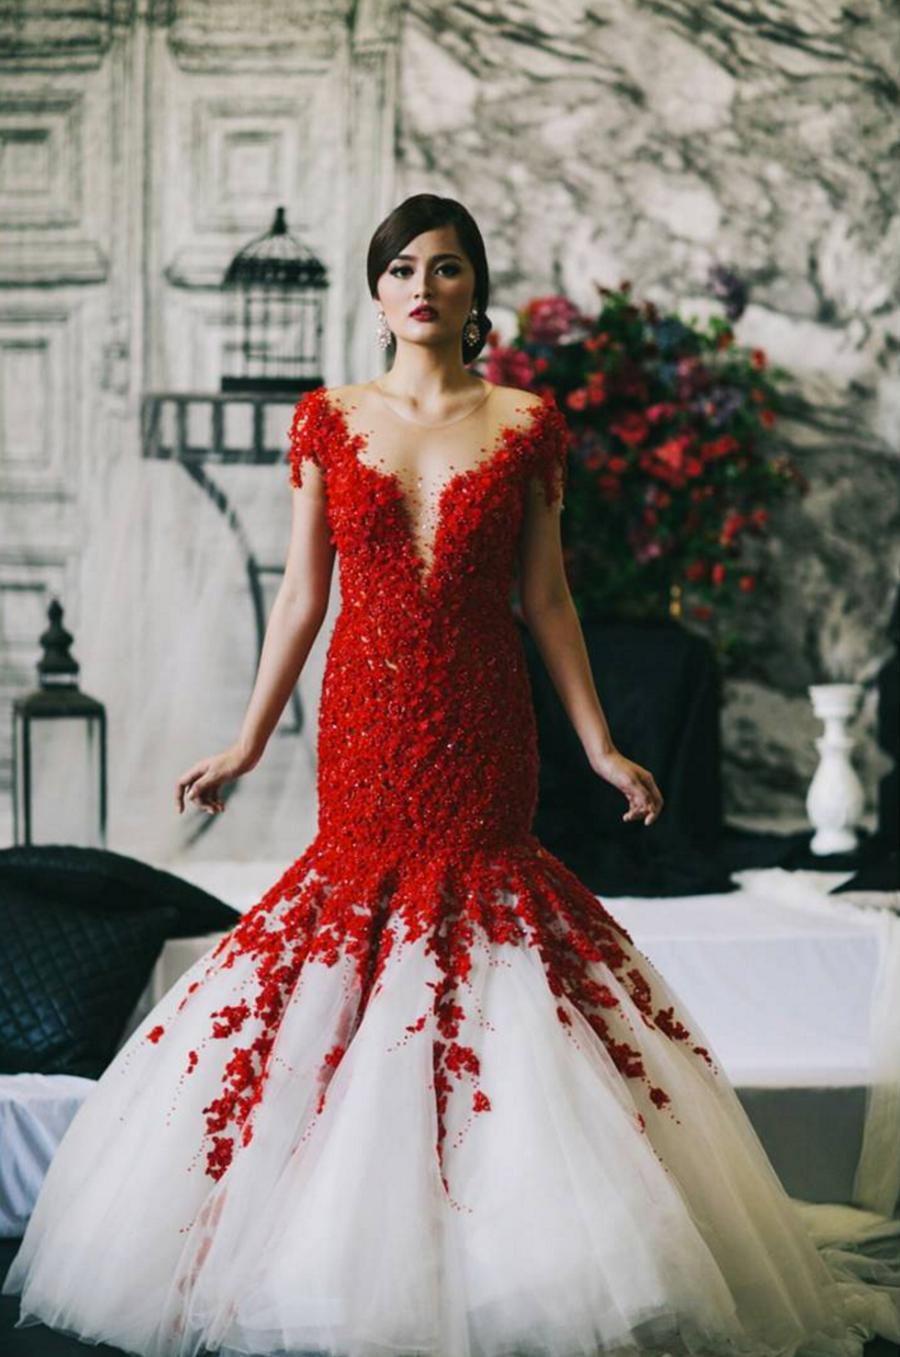 Social Media Sensation Wedding Dress Designer Mak Tumang Red Wedding Gowns Red Wedding Dresses Most Beautiful Wedding Dresses [ 1357 x 900 Pixel ]